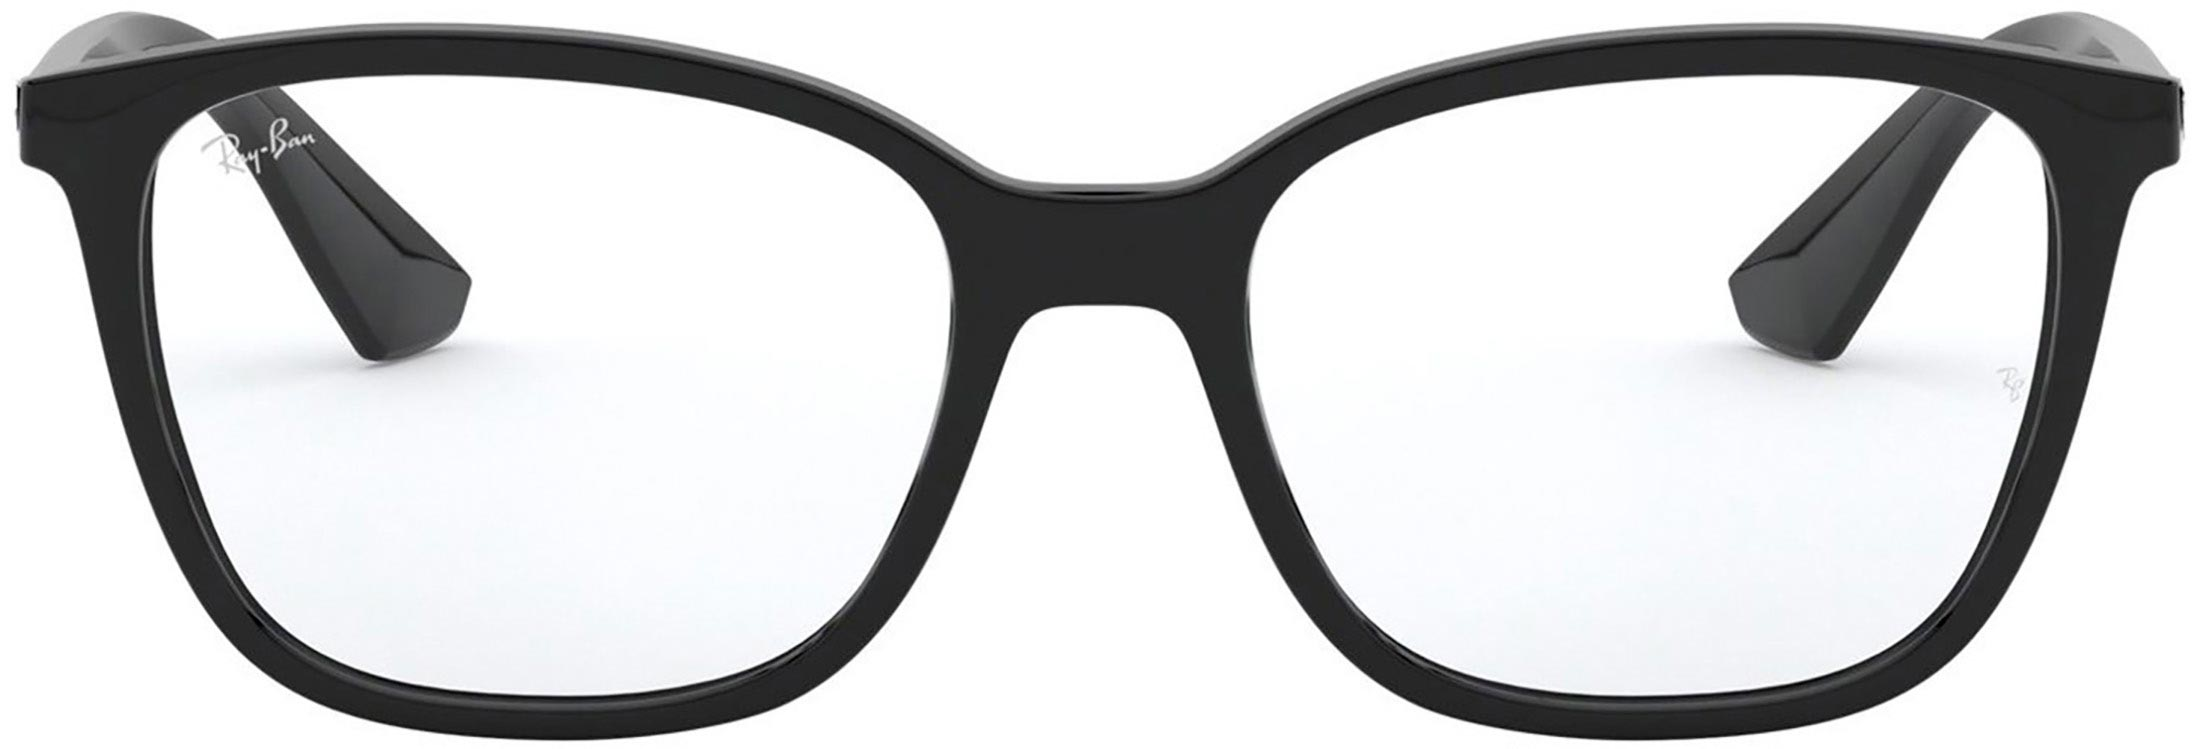 39d2eba99f132 Ray-Ban rb7066 Prescription Eyeglasses